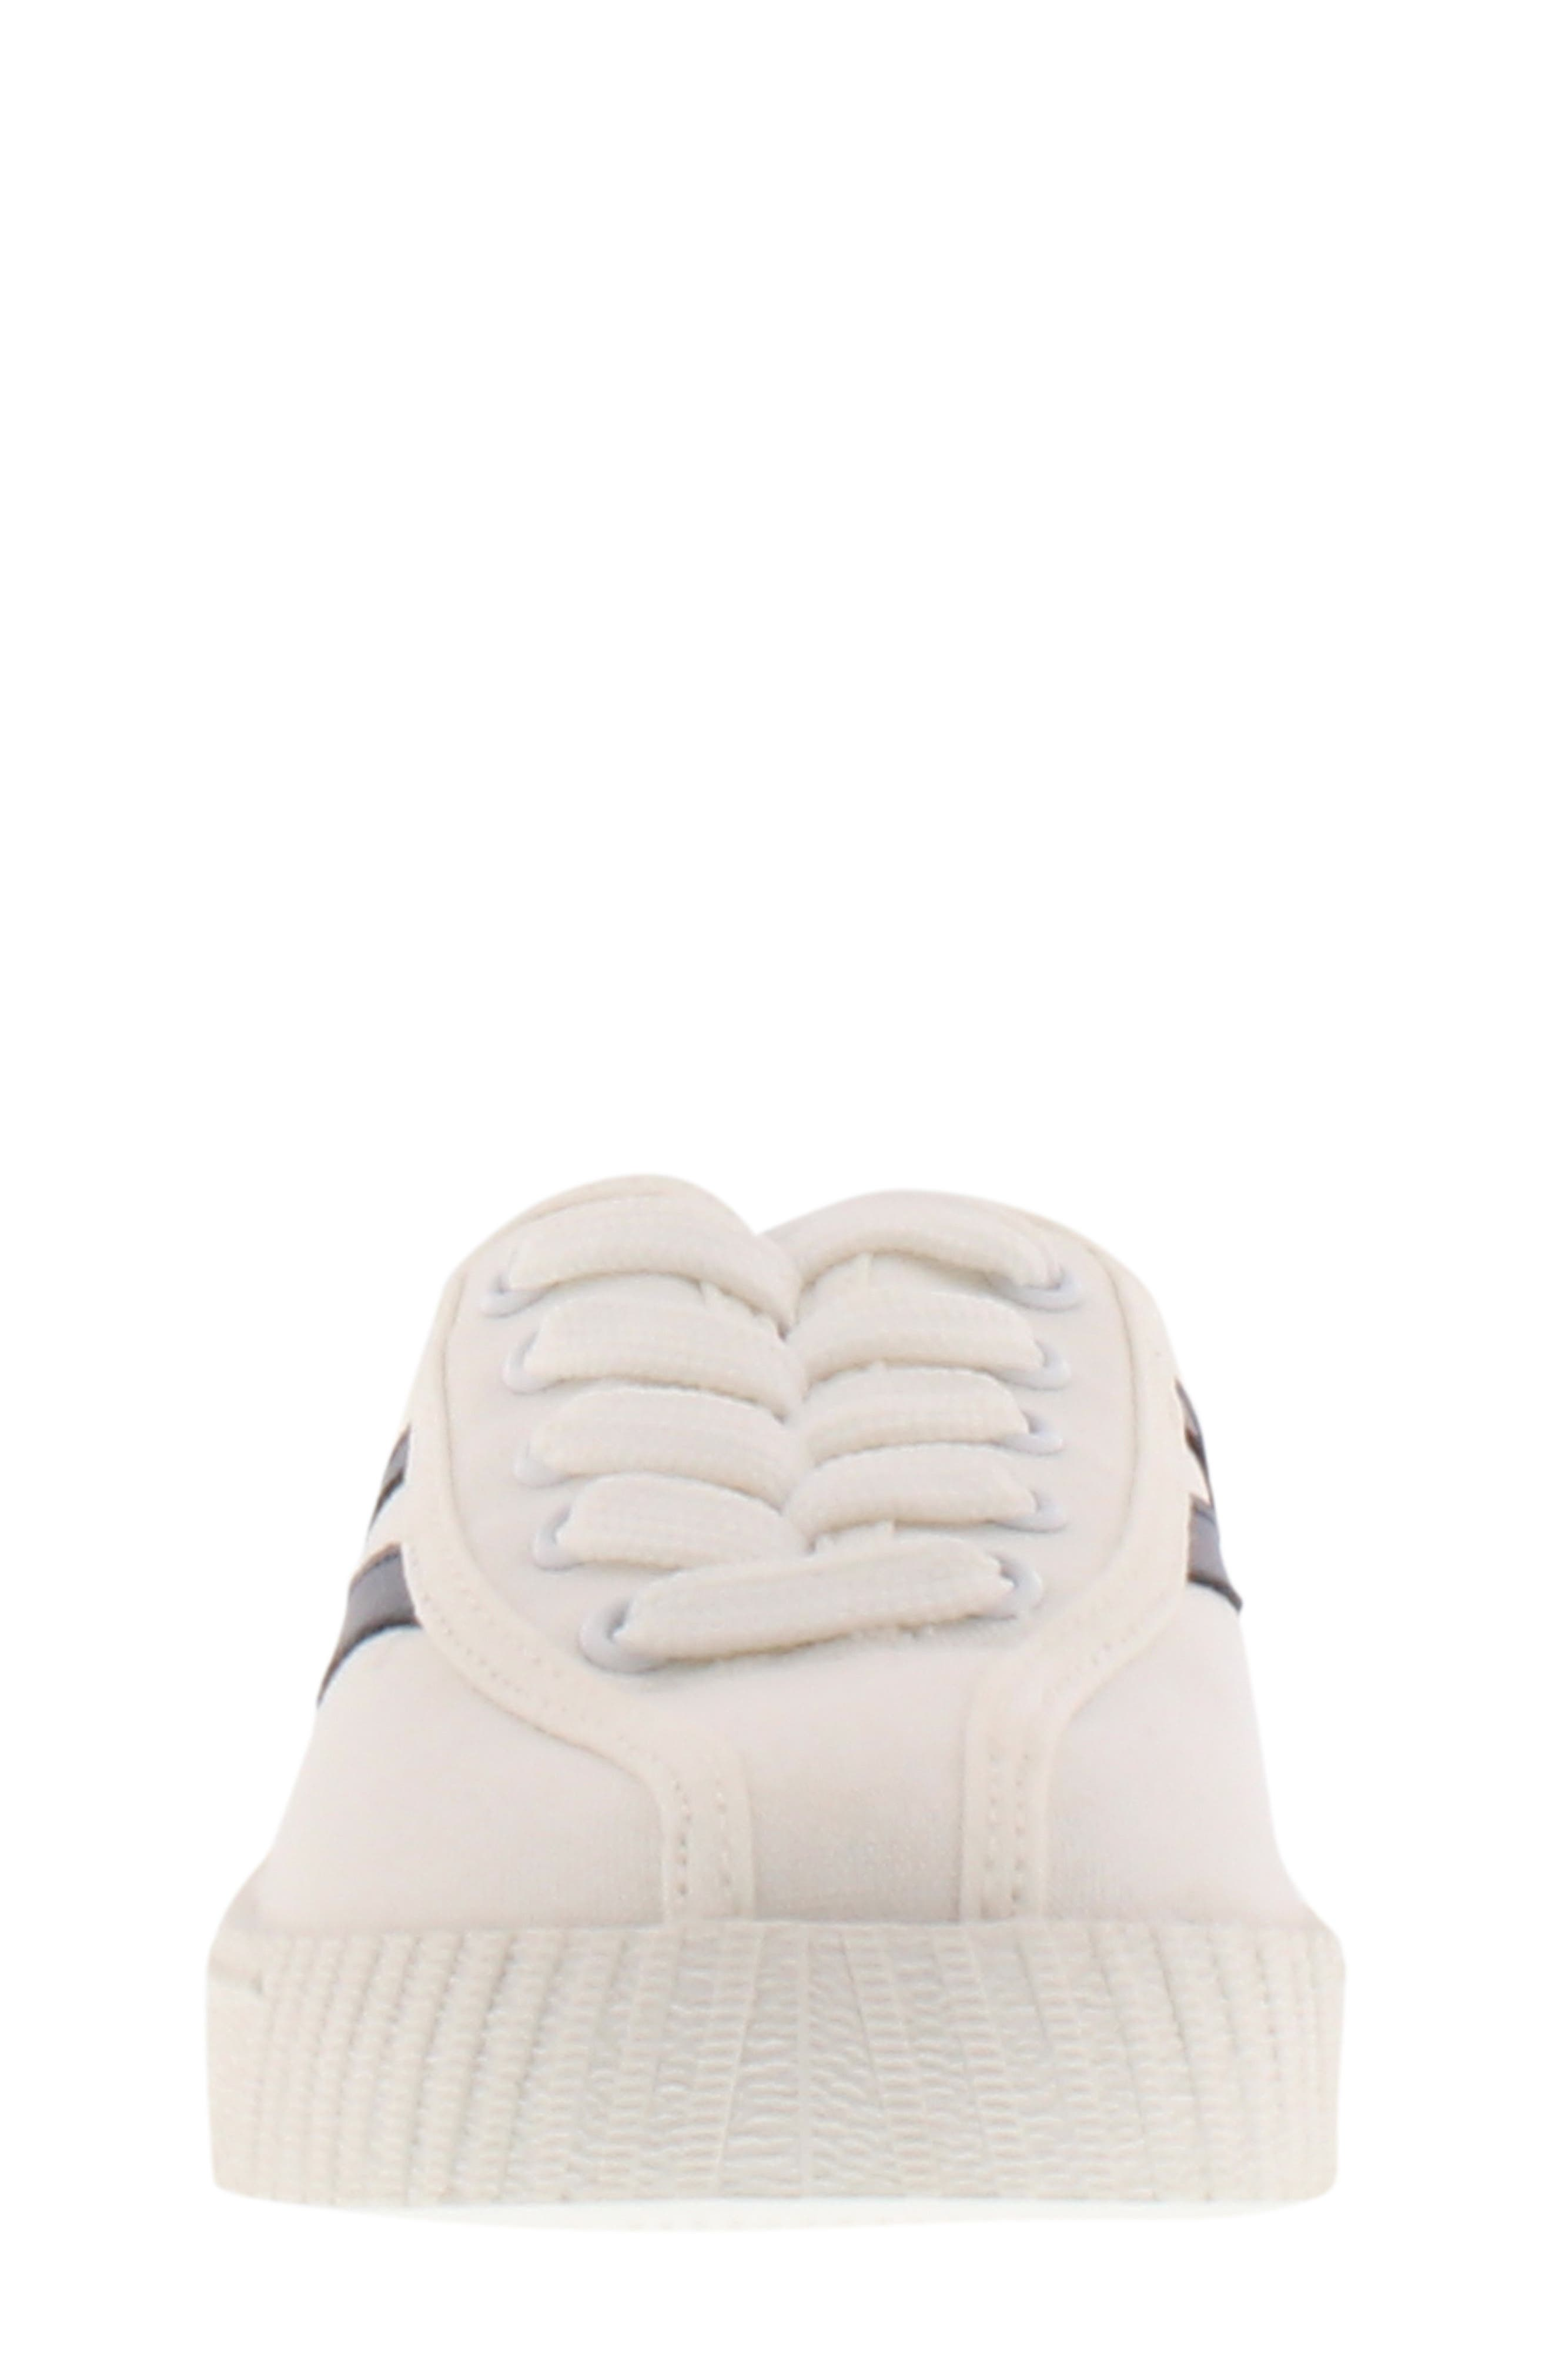 Nylite Plus Sneaker,                             Alternate thumbnail 4, color,                             WHITE/ NIGHT